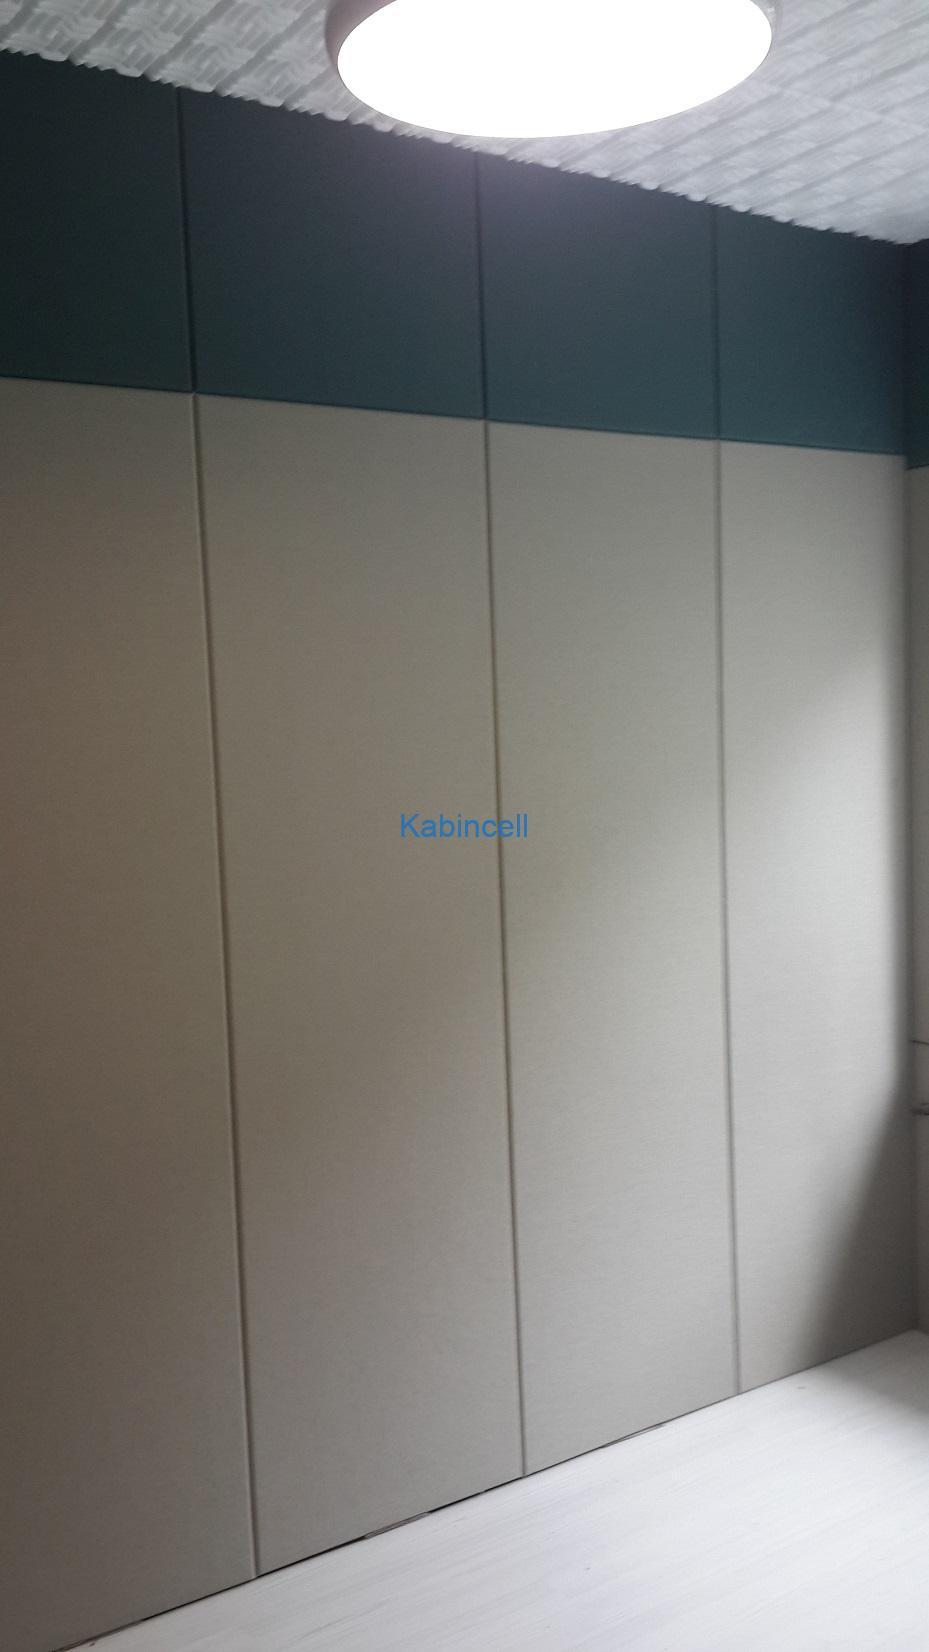 radyo-kayit-odasi-akustik-yalitim2